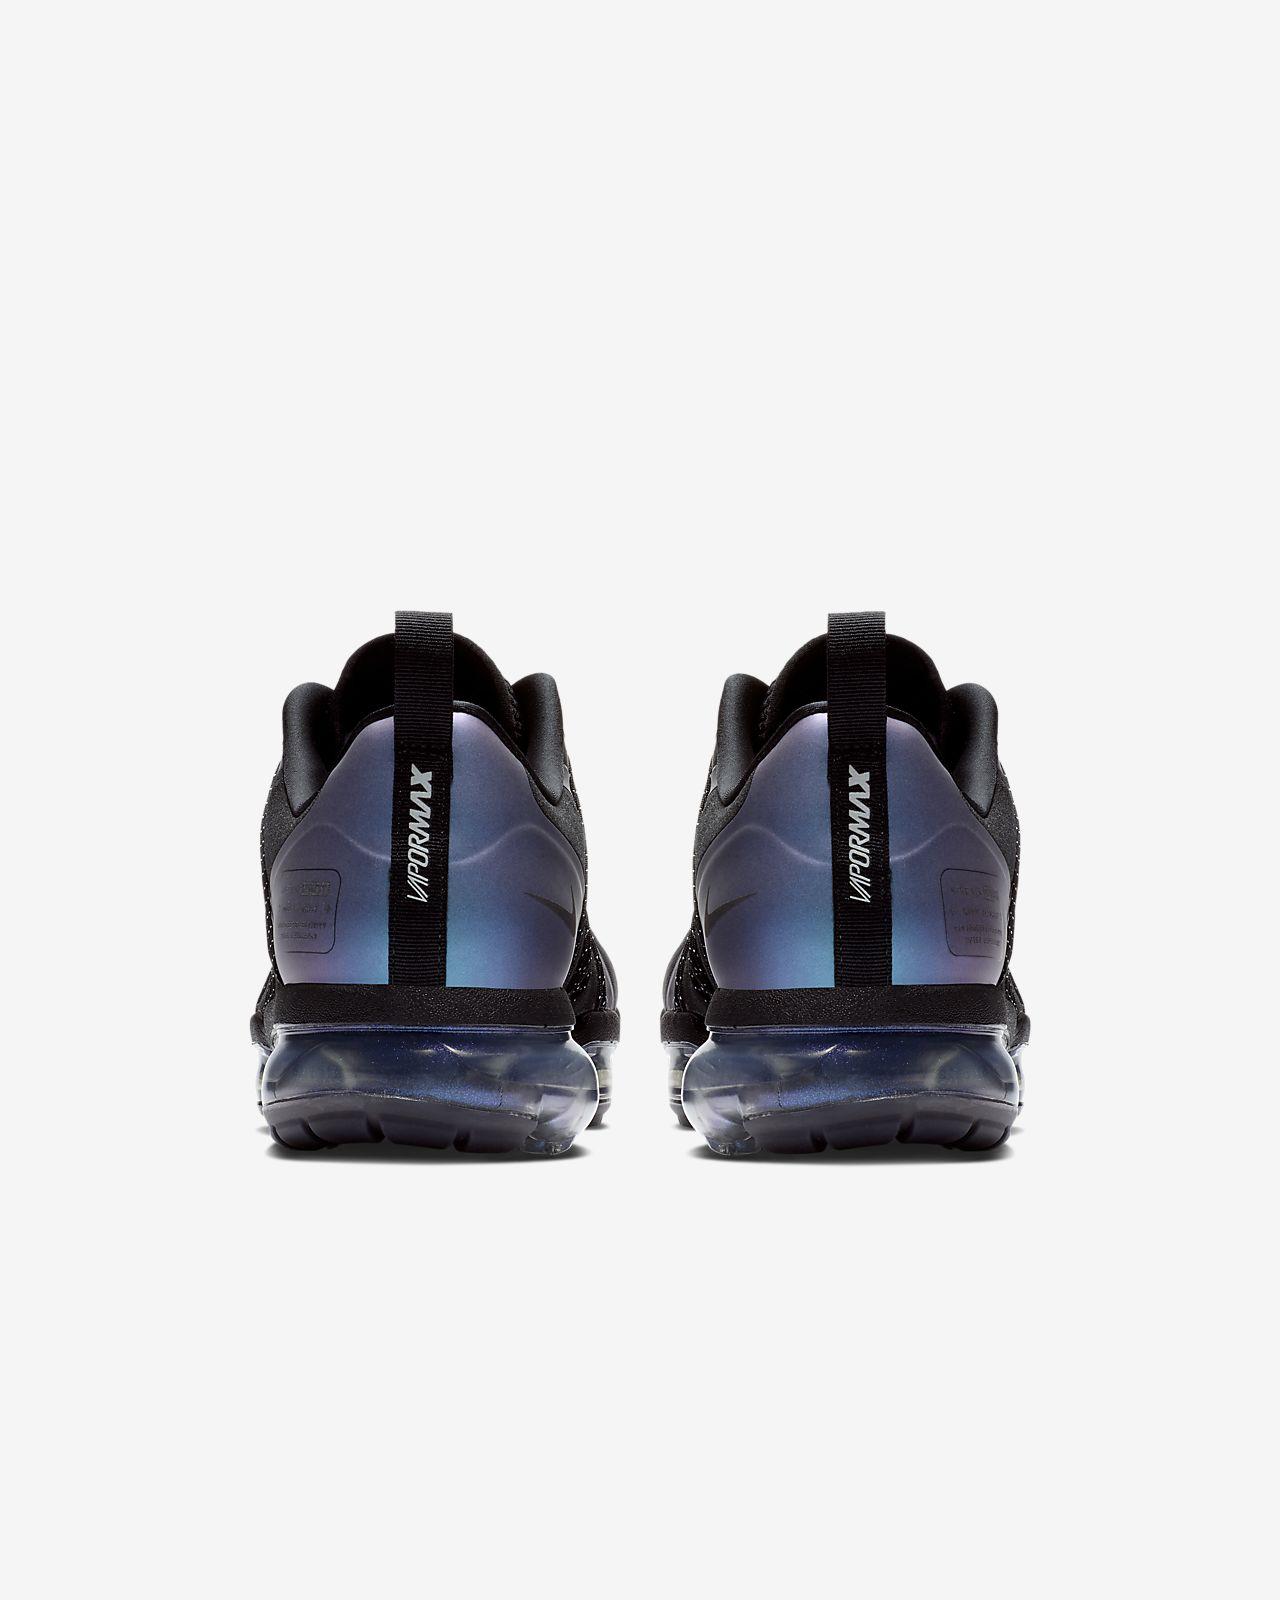 brand new 6d397 df824 ... Nike Air VaporMax Utility Men s Shoe